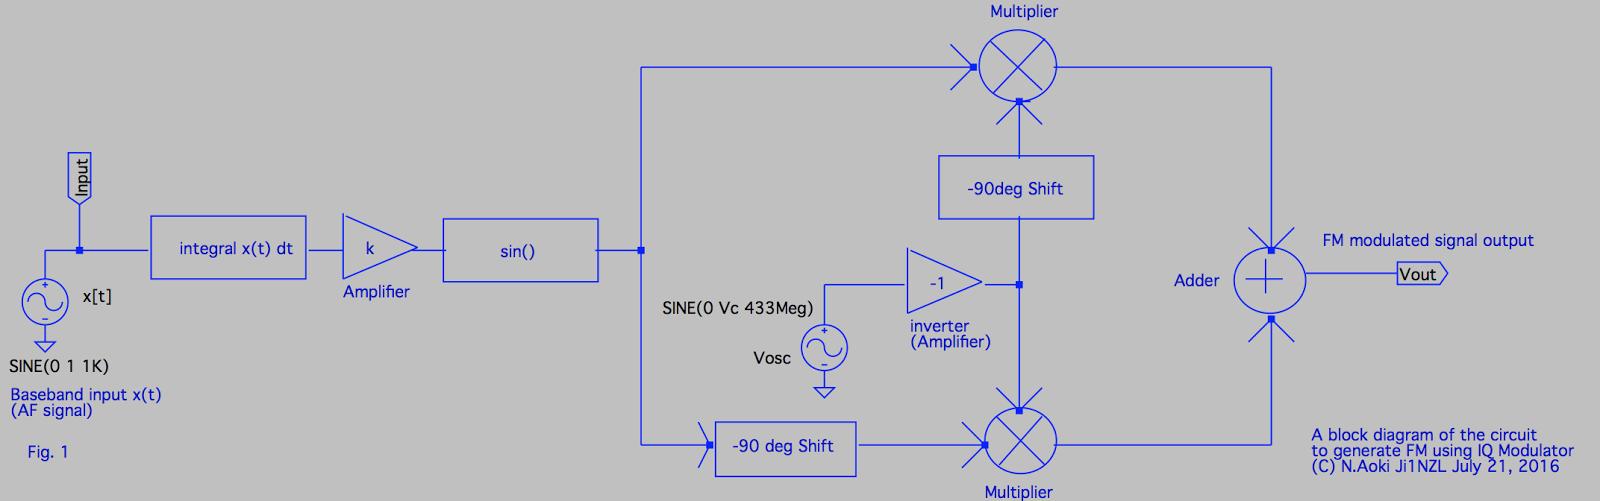 hight resolution of fm modulator used an iq modulator